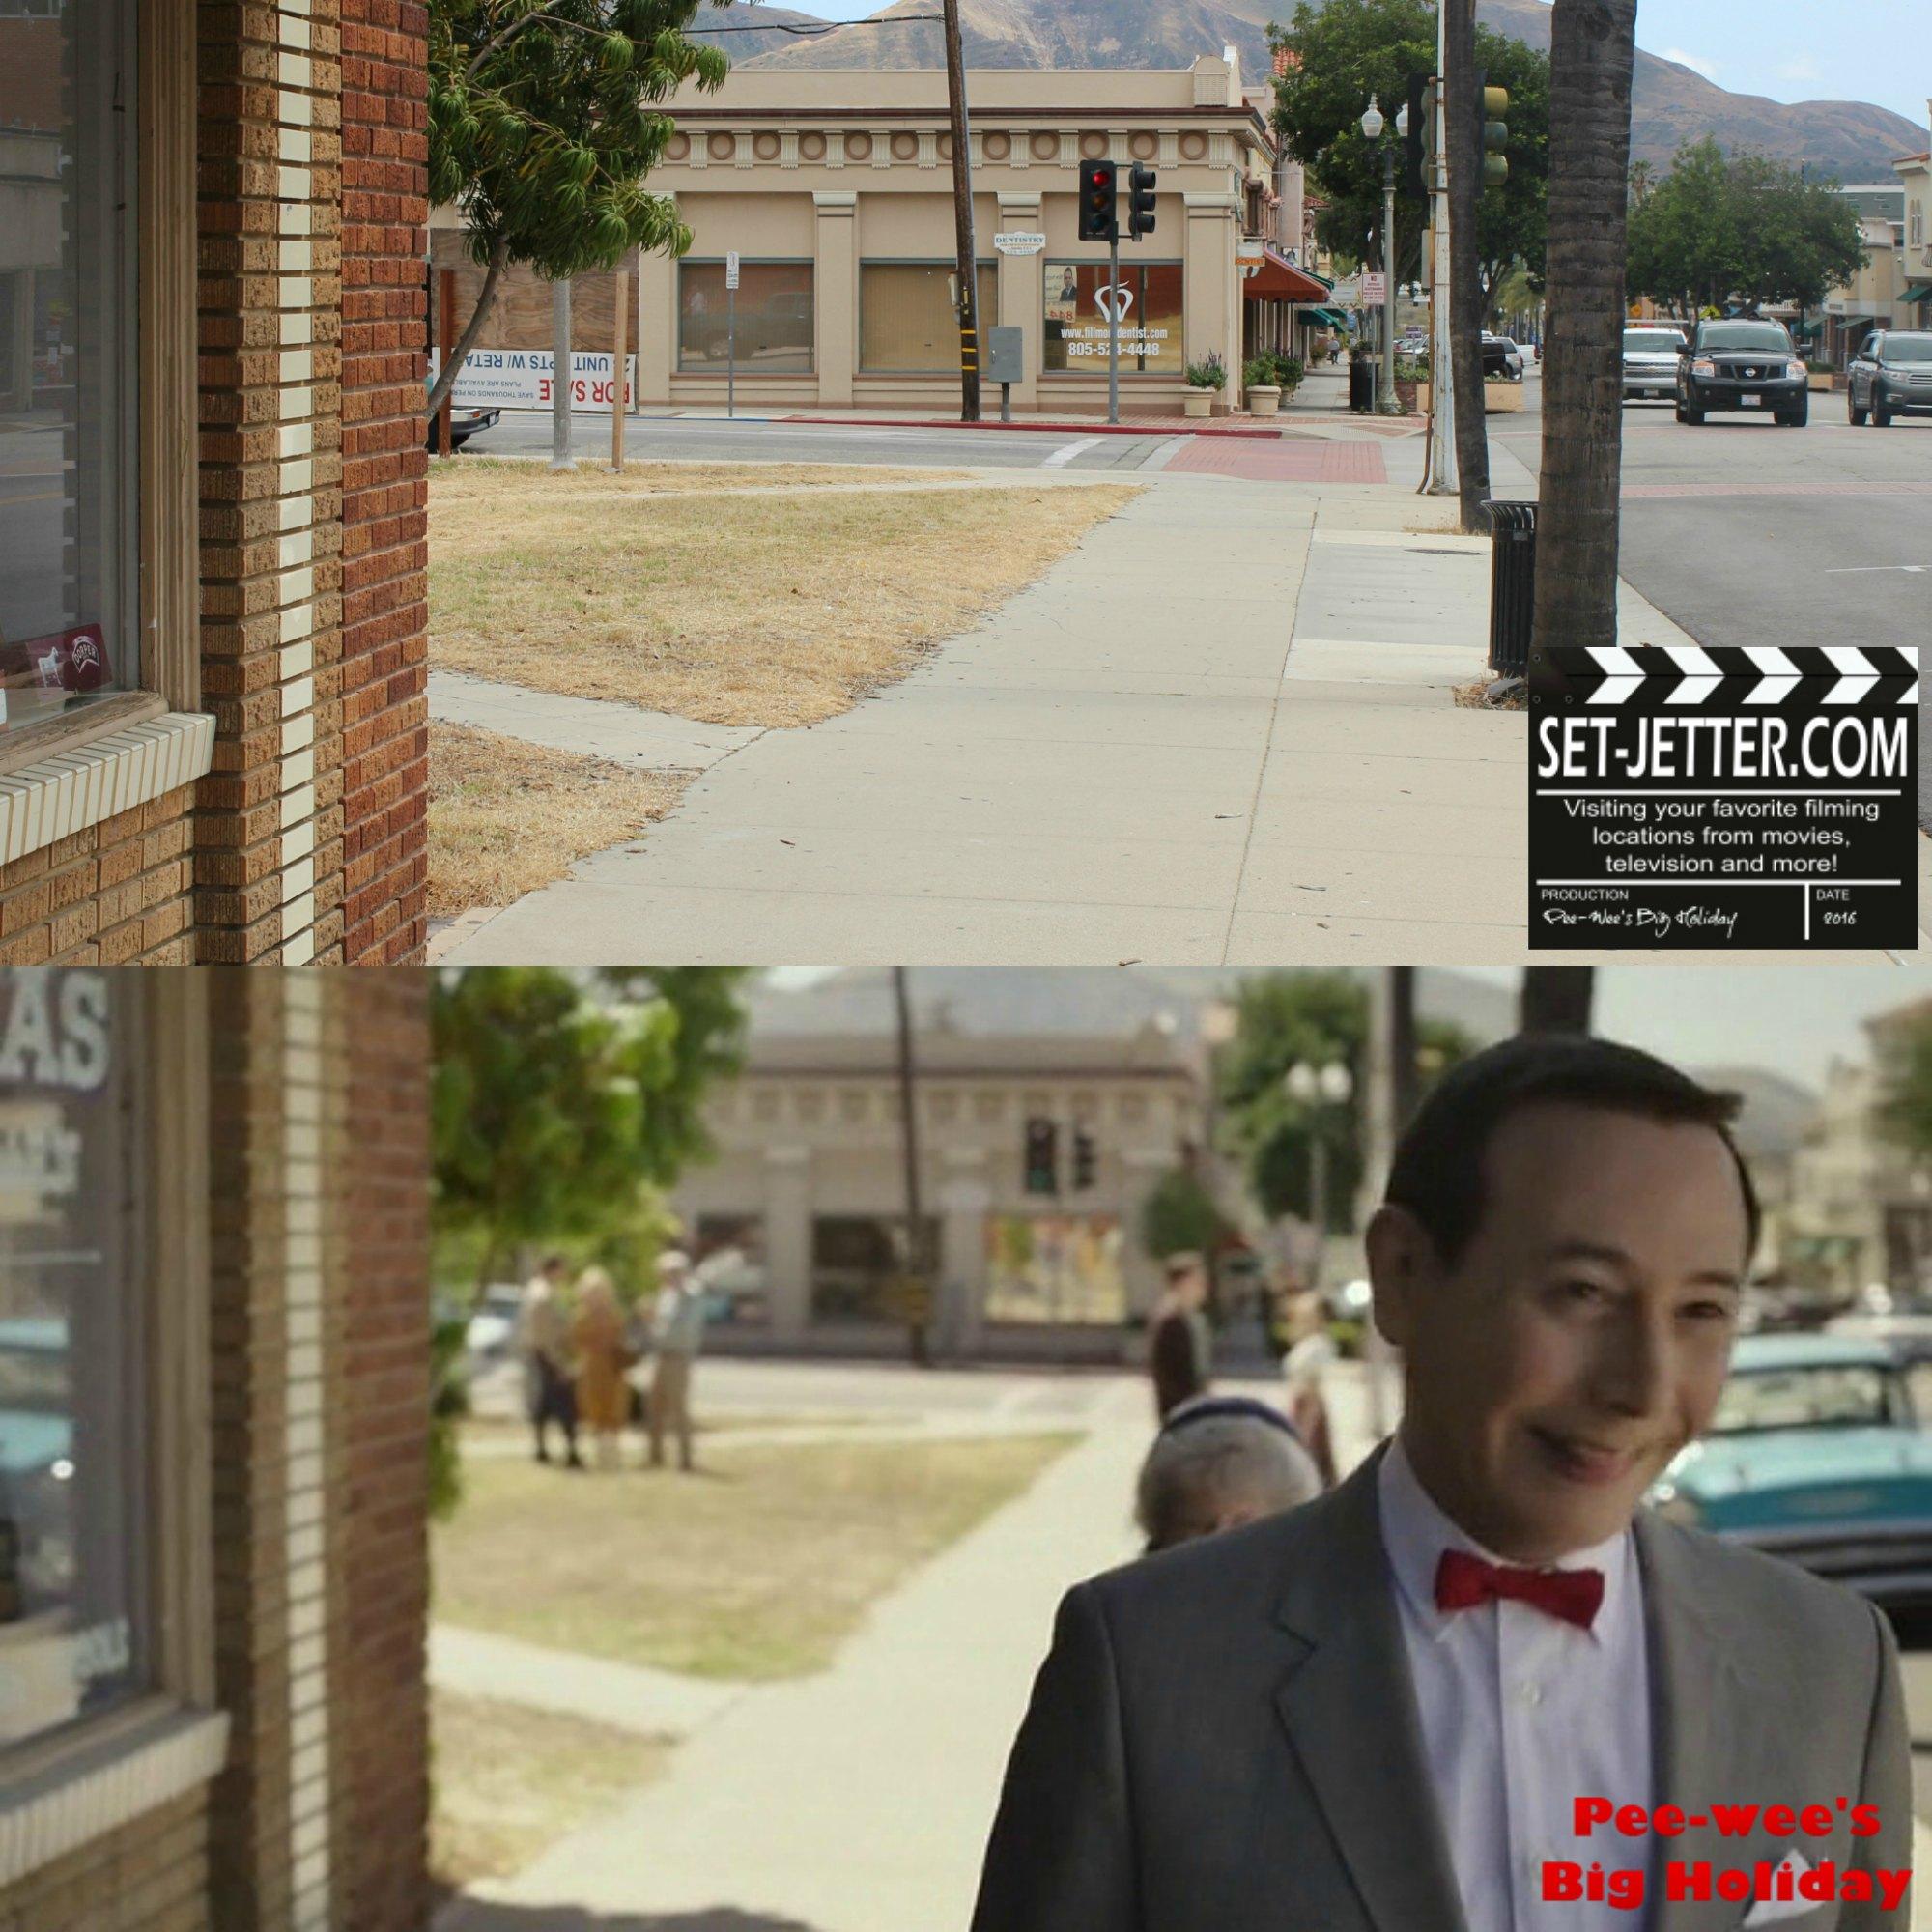 Pee Wee's Big Holiday comparison 249.jpg